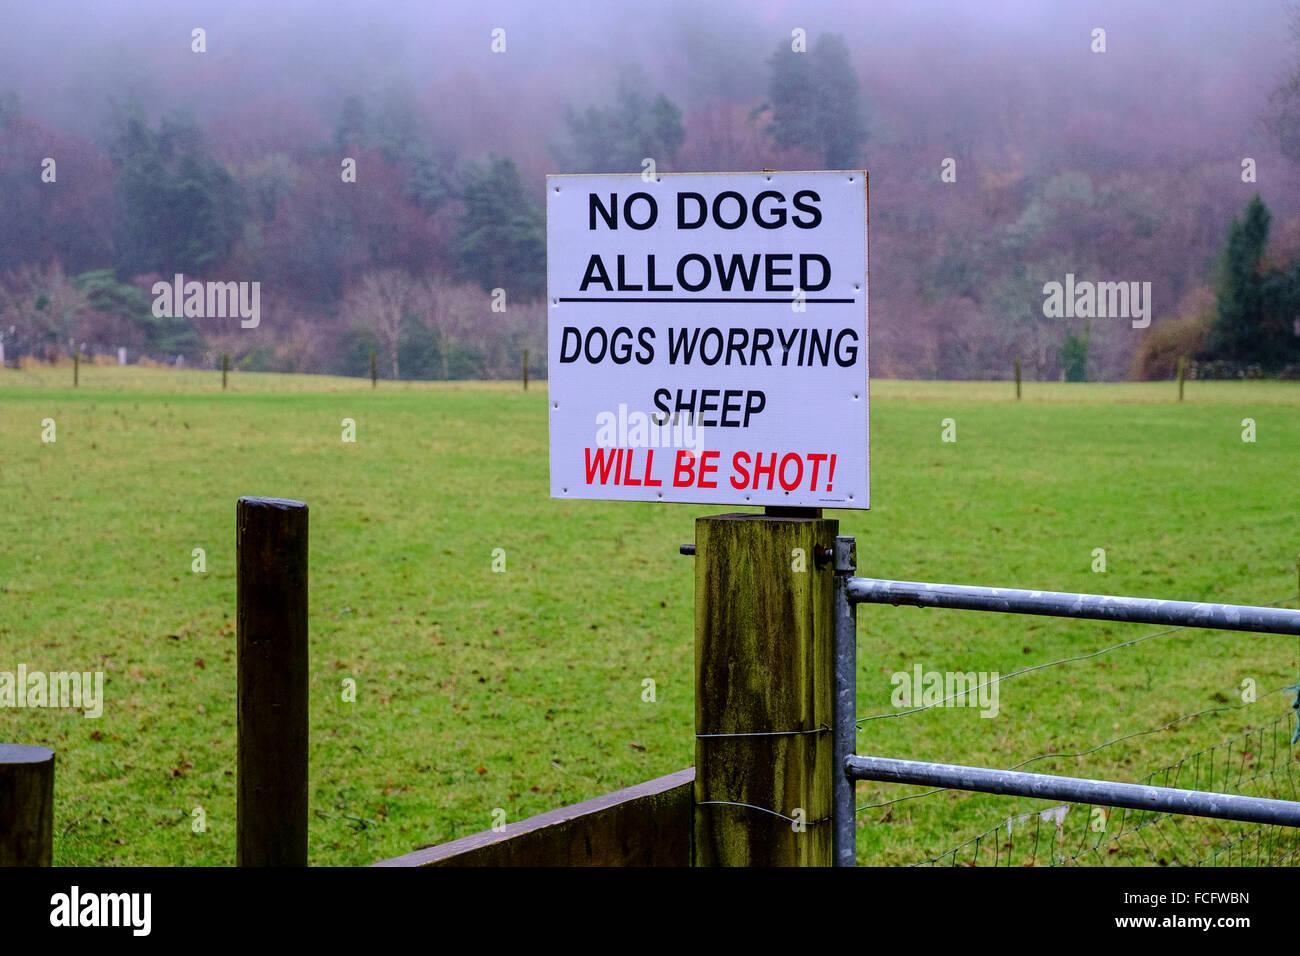 Chiens non admis avertissement agricole ferme Royaume-Uni Photo Stock